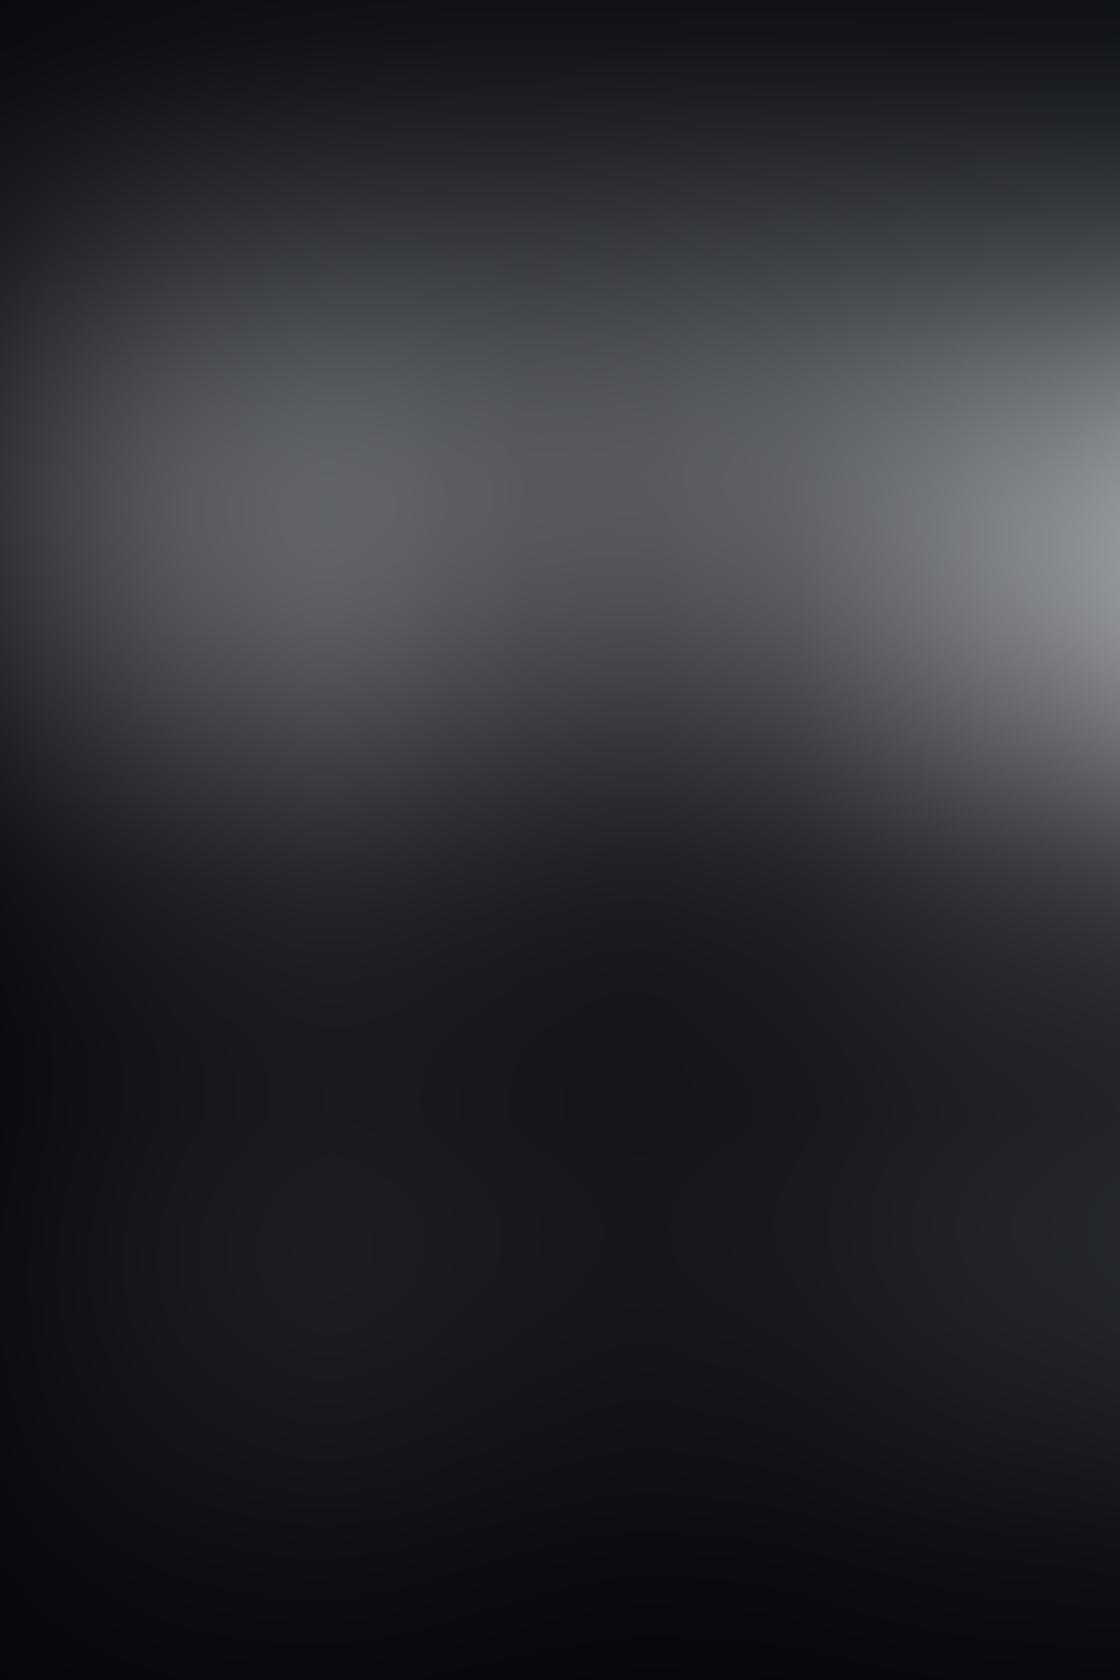 iPhone Photos Low Angle 13